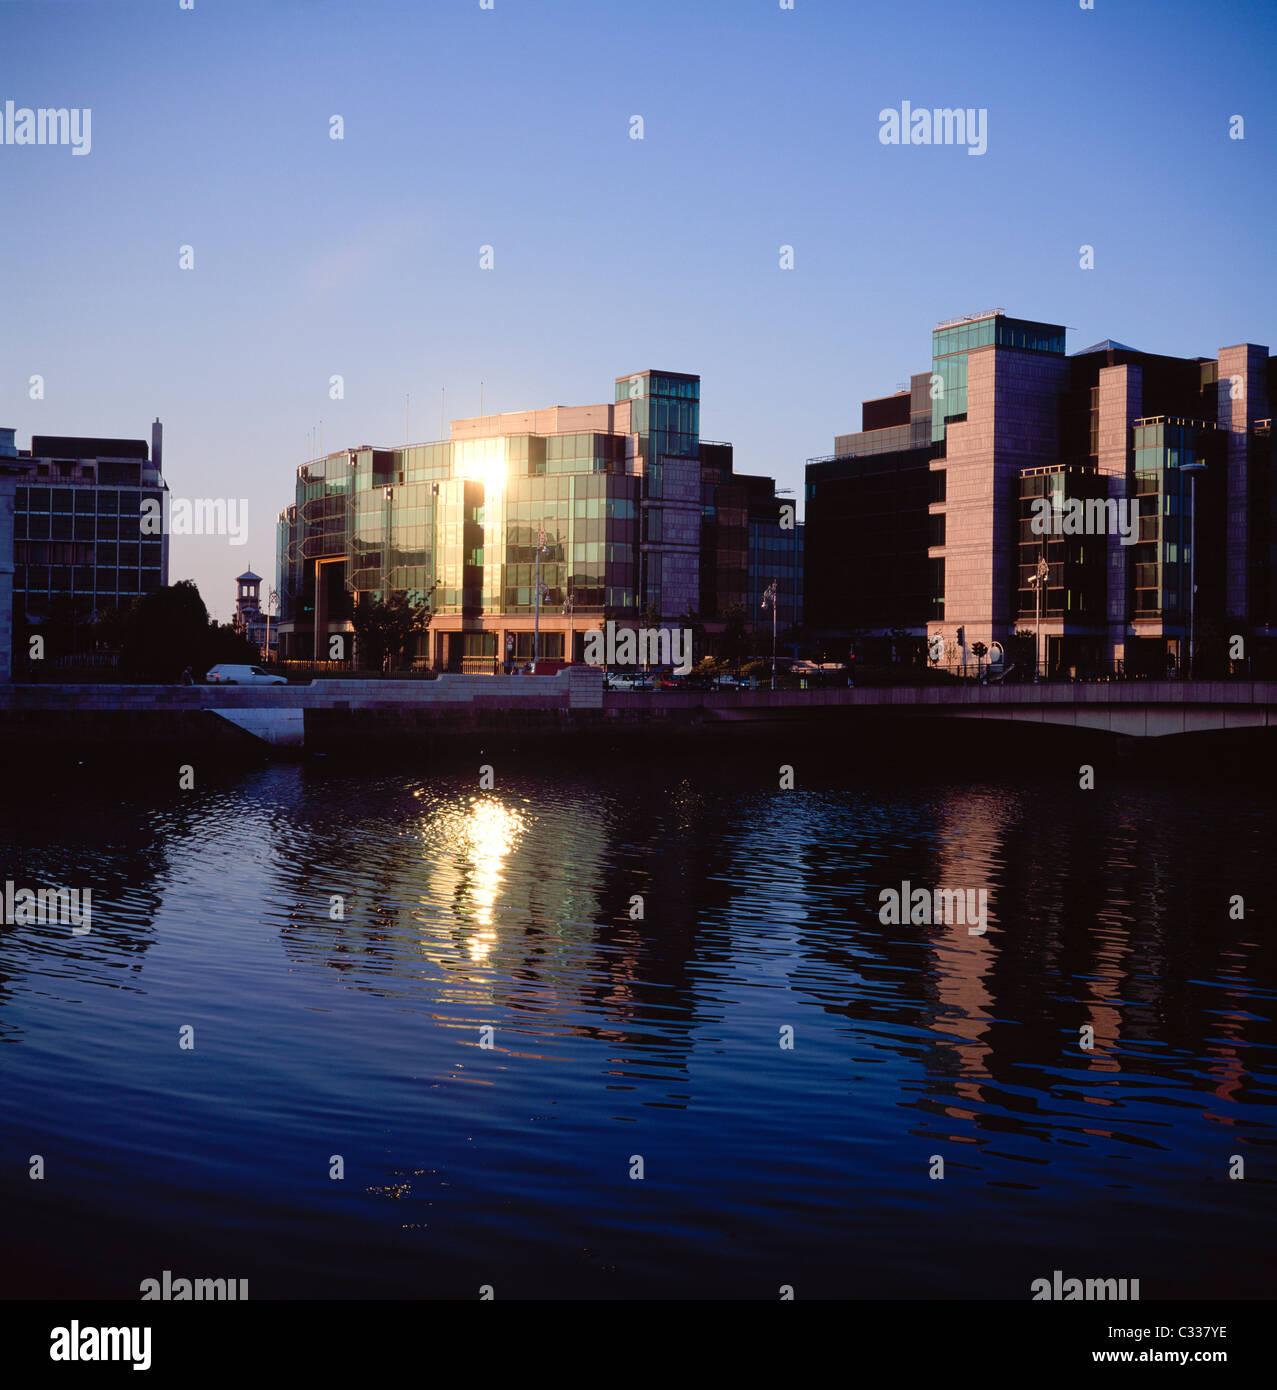 Dublin, Co Dublin, Ireland, International Financial Services Centre (Ifsc) - Stock Image